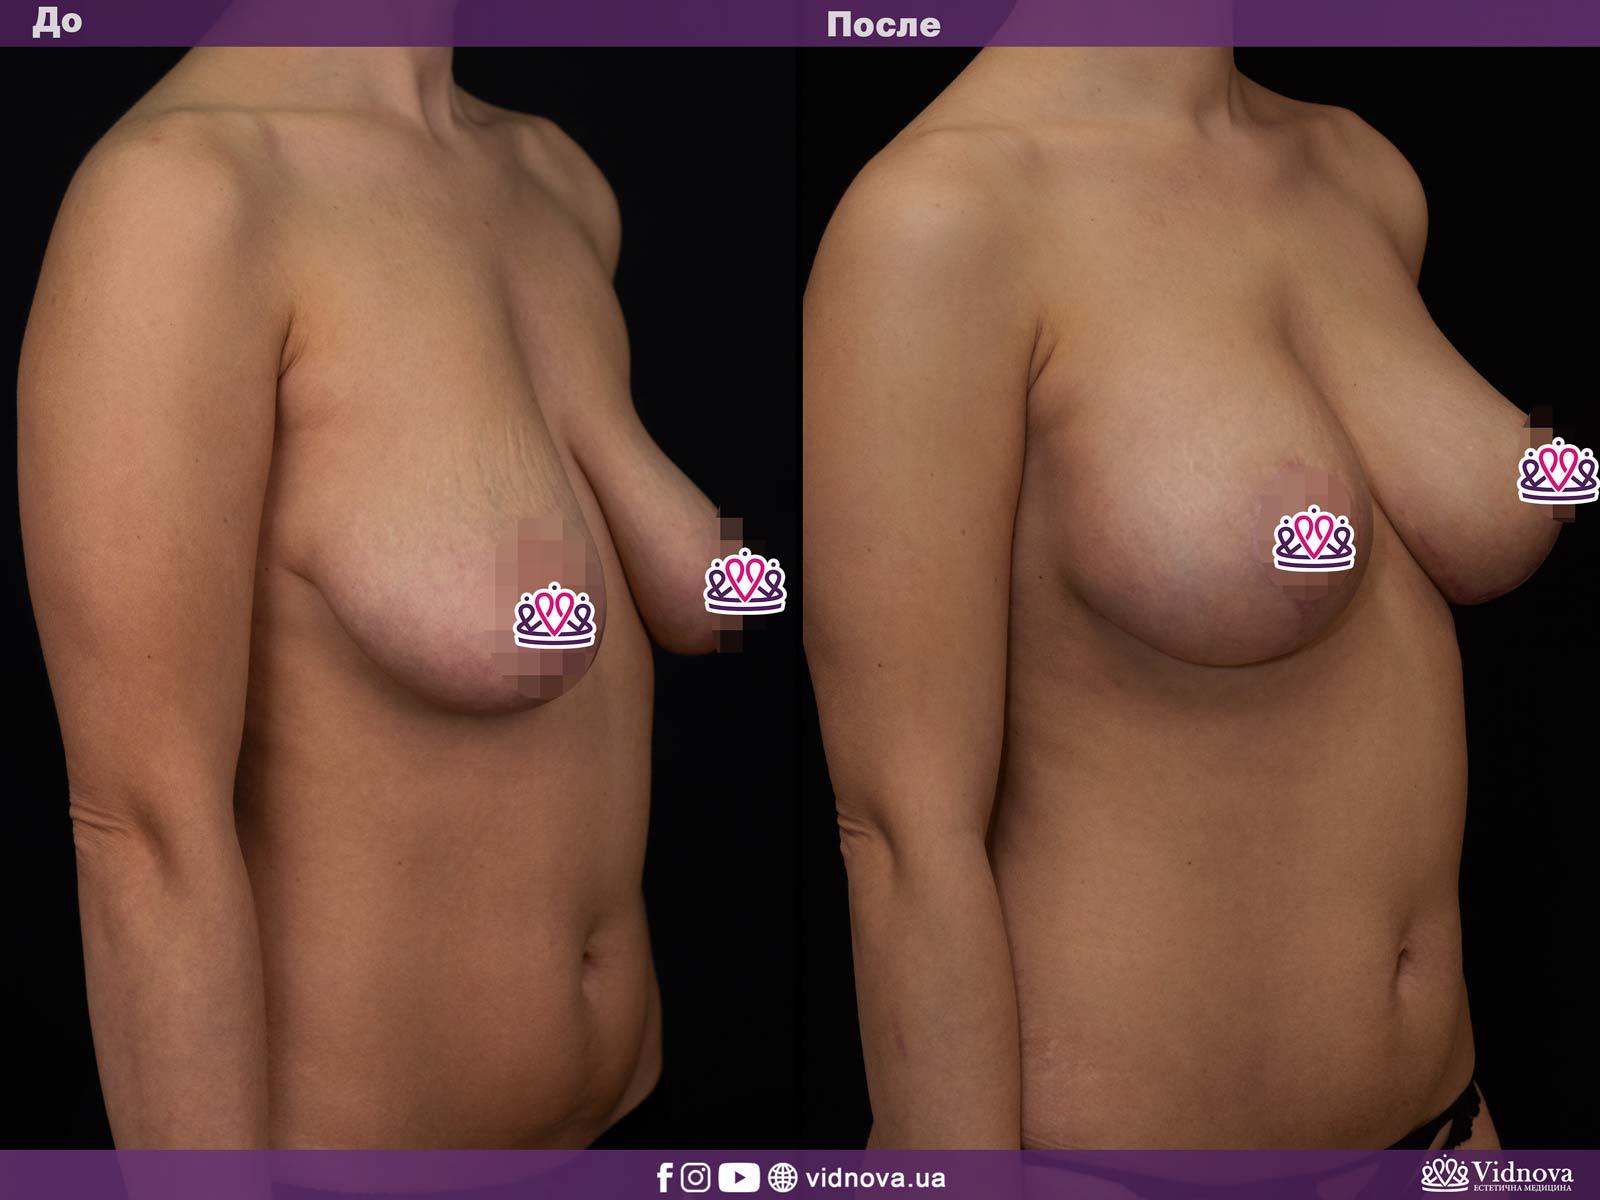 Подтяжка груди: Фото ДО и ПОСЛЕ - Пример №1-2 - Клиника Vidnova